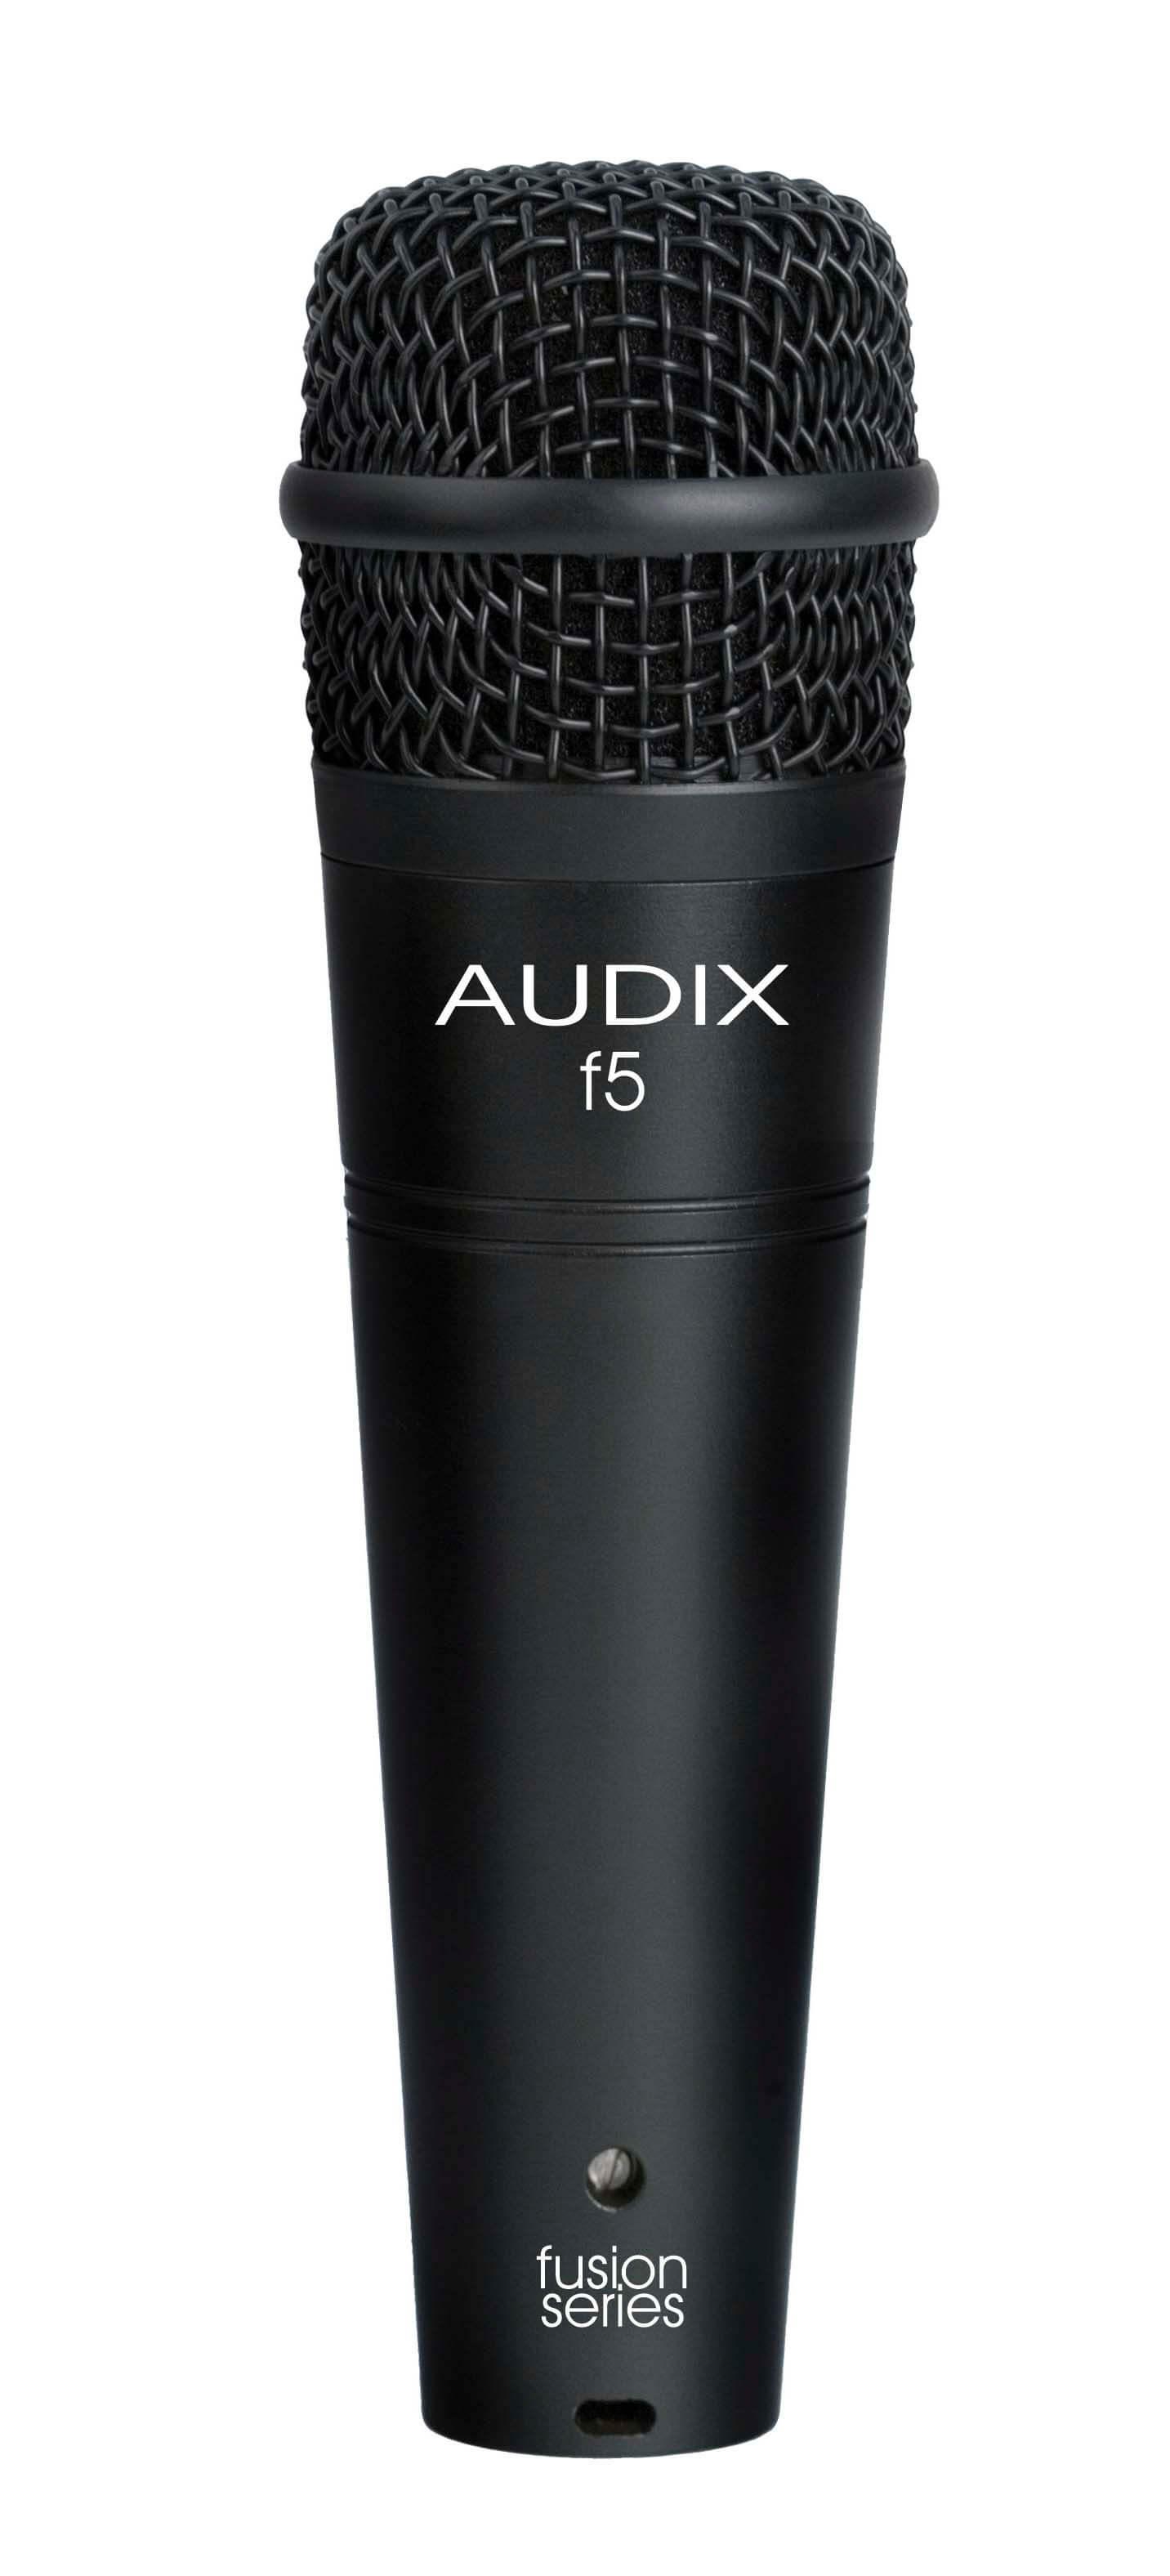 Micrófono dinámico de instrumento Audix F5